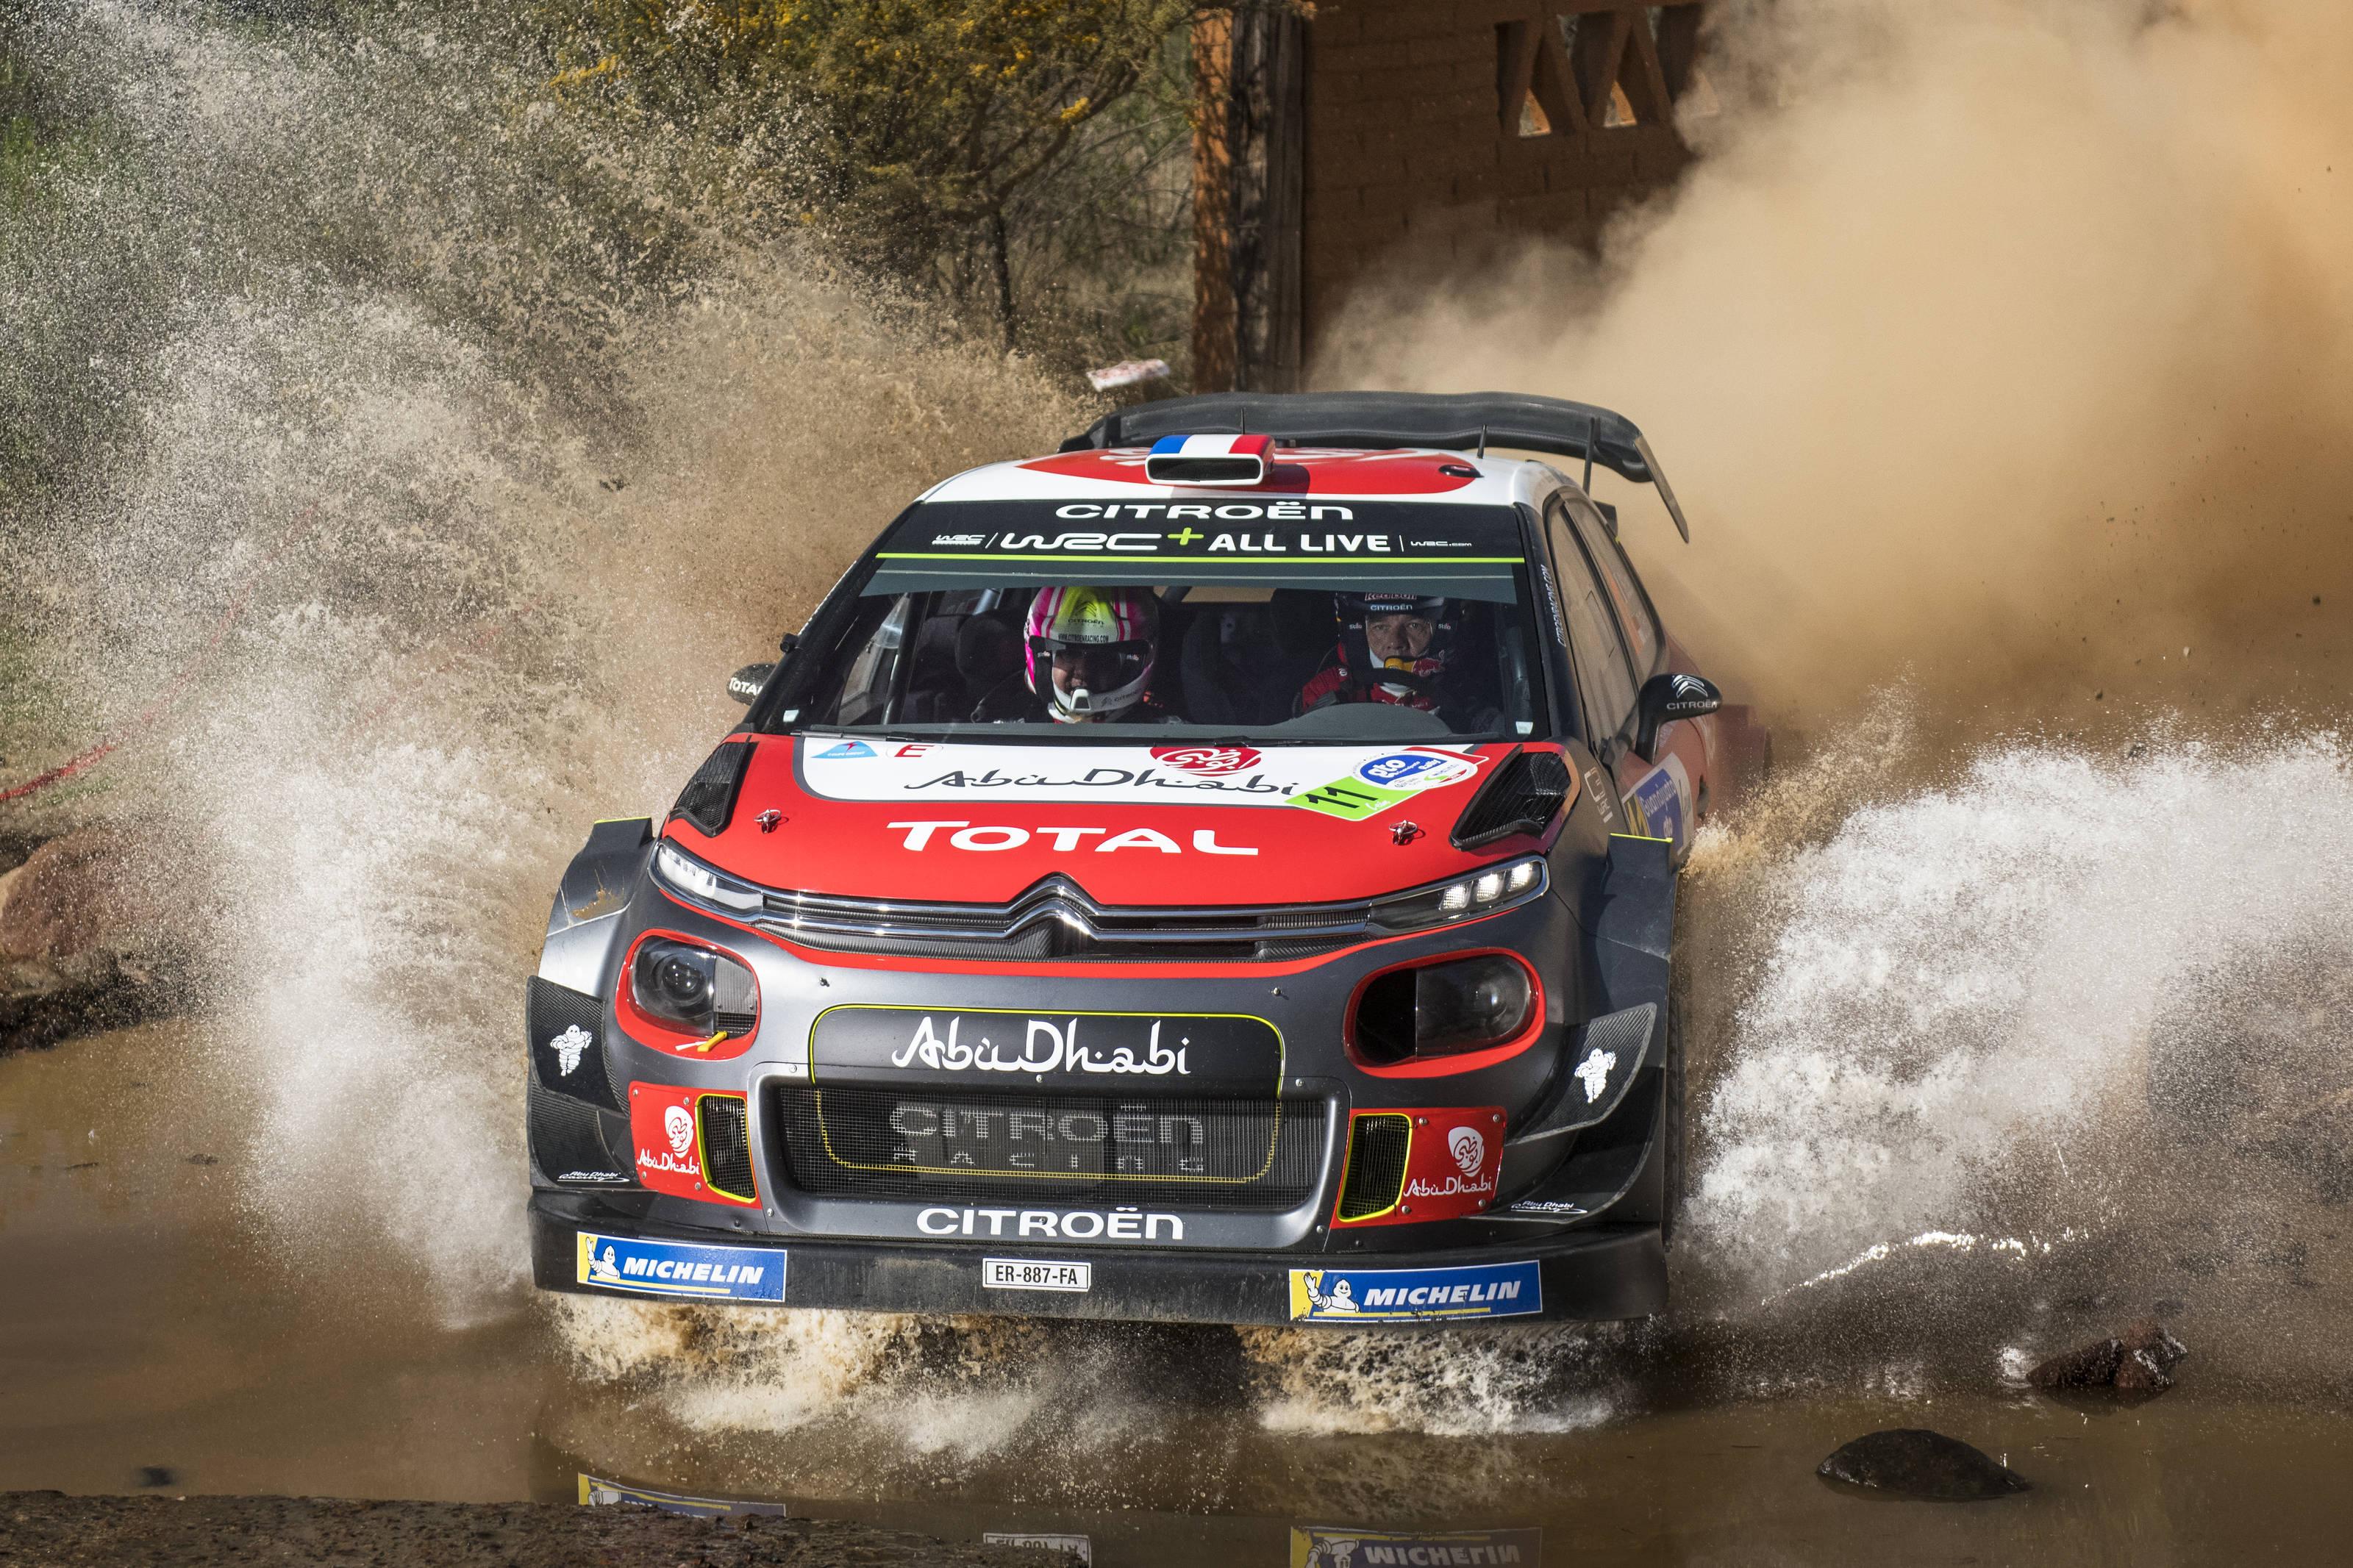 fia world rally championship rally mexico sensational comeback for loeb asc action sports. Black Bedroom Furniture Sets. Home Design Ideas